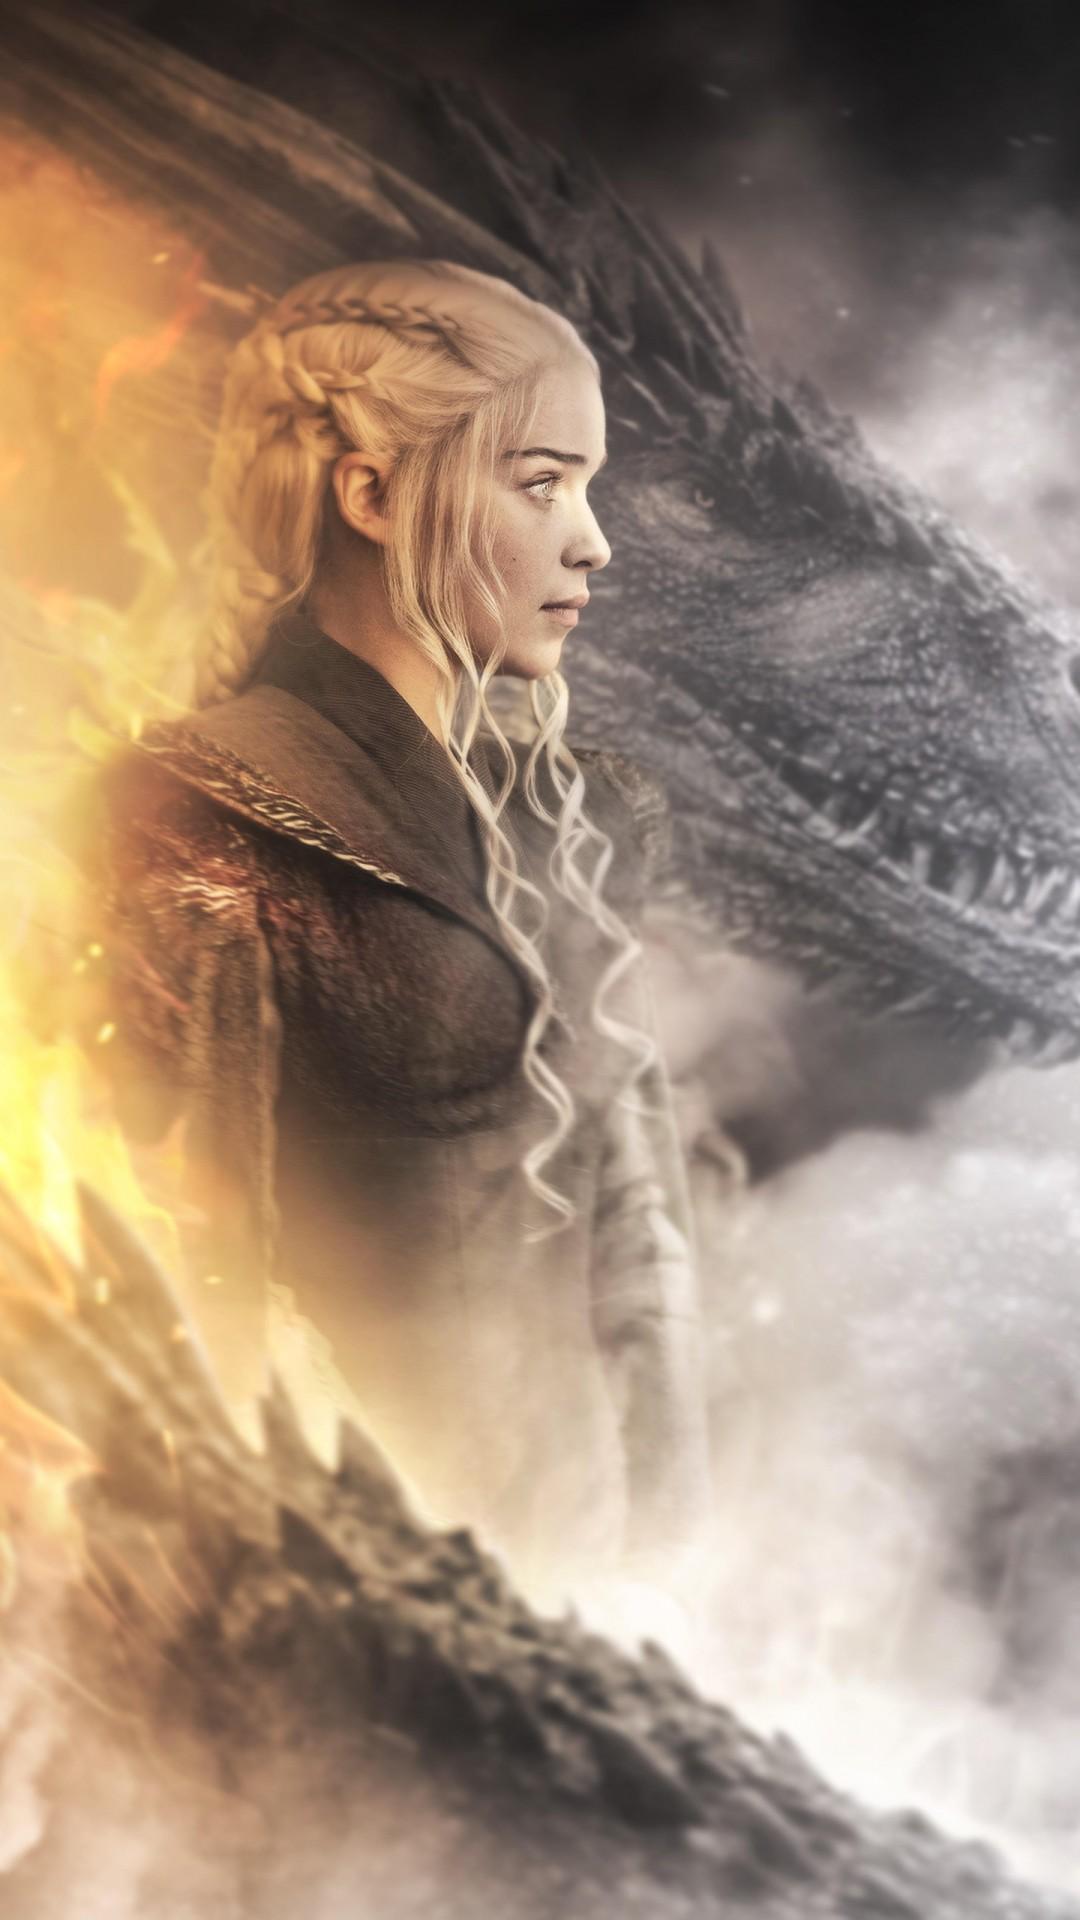 Game Of Thrones Daenerys Dragon Poster 1080x1920 Download Hd Wallpaper Wallpapertip